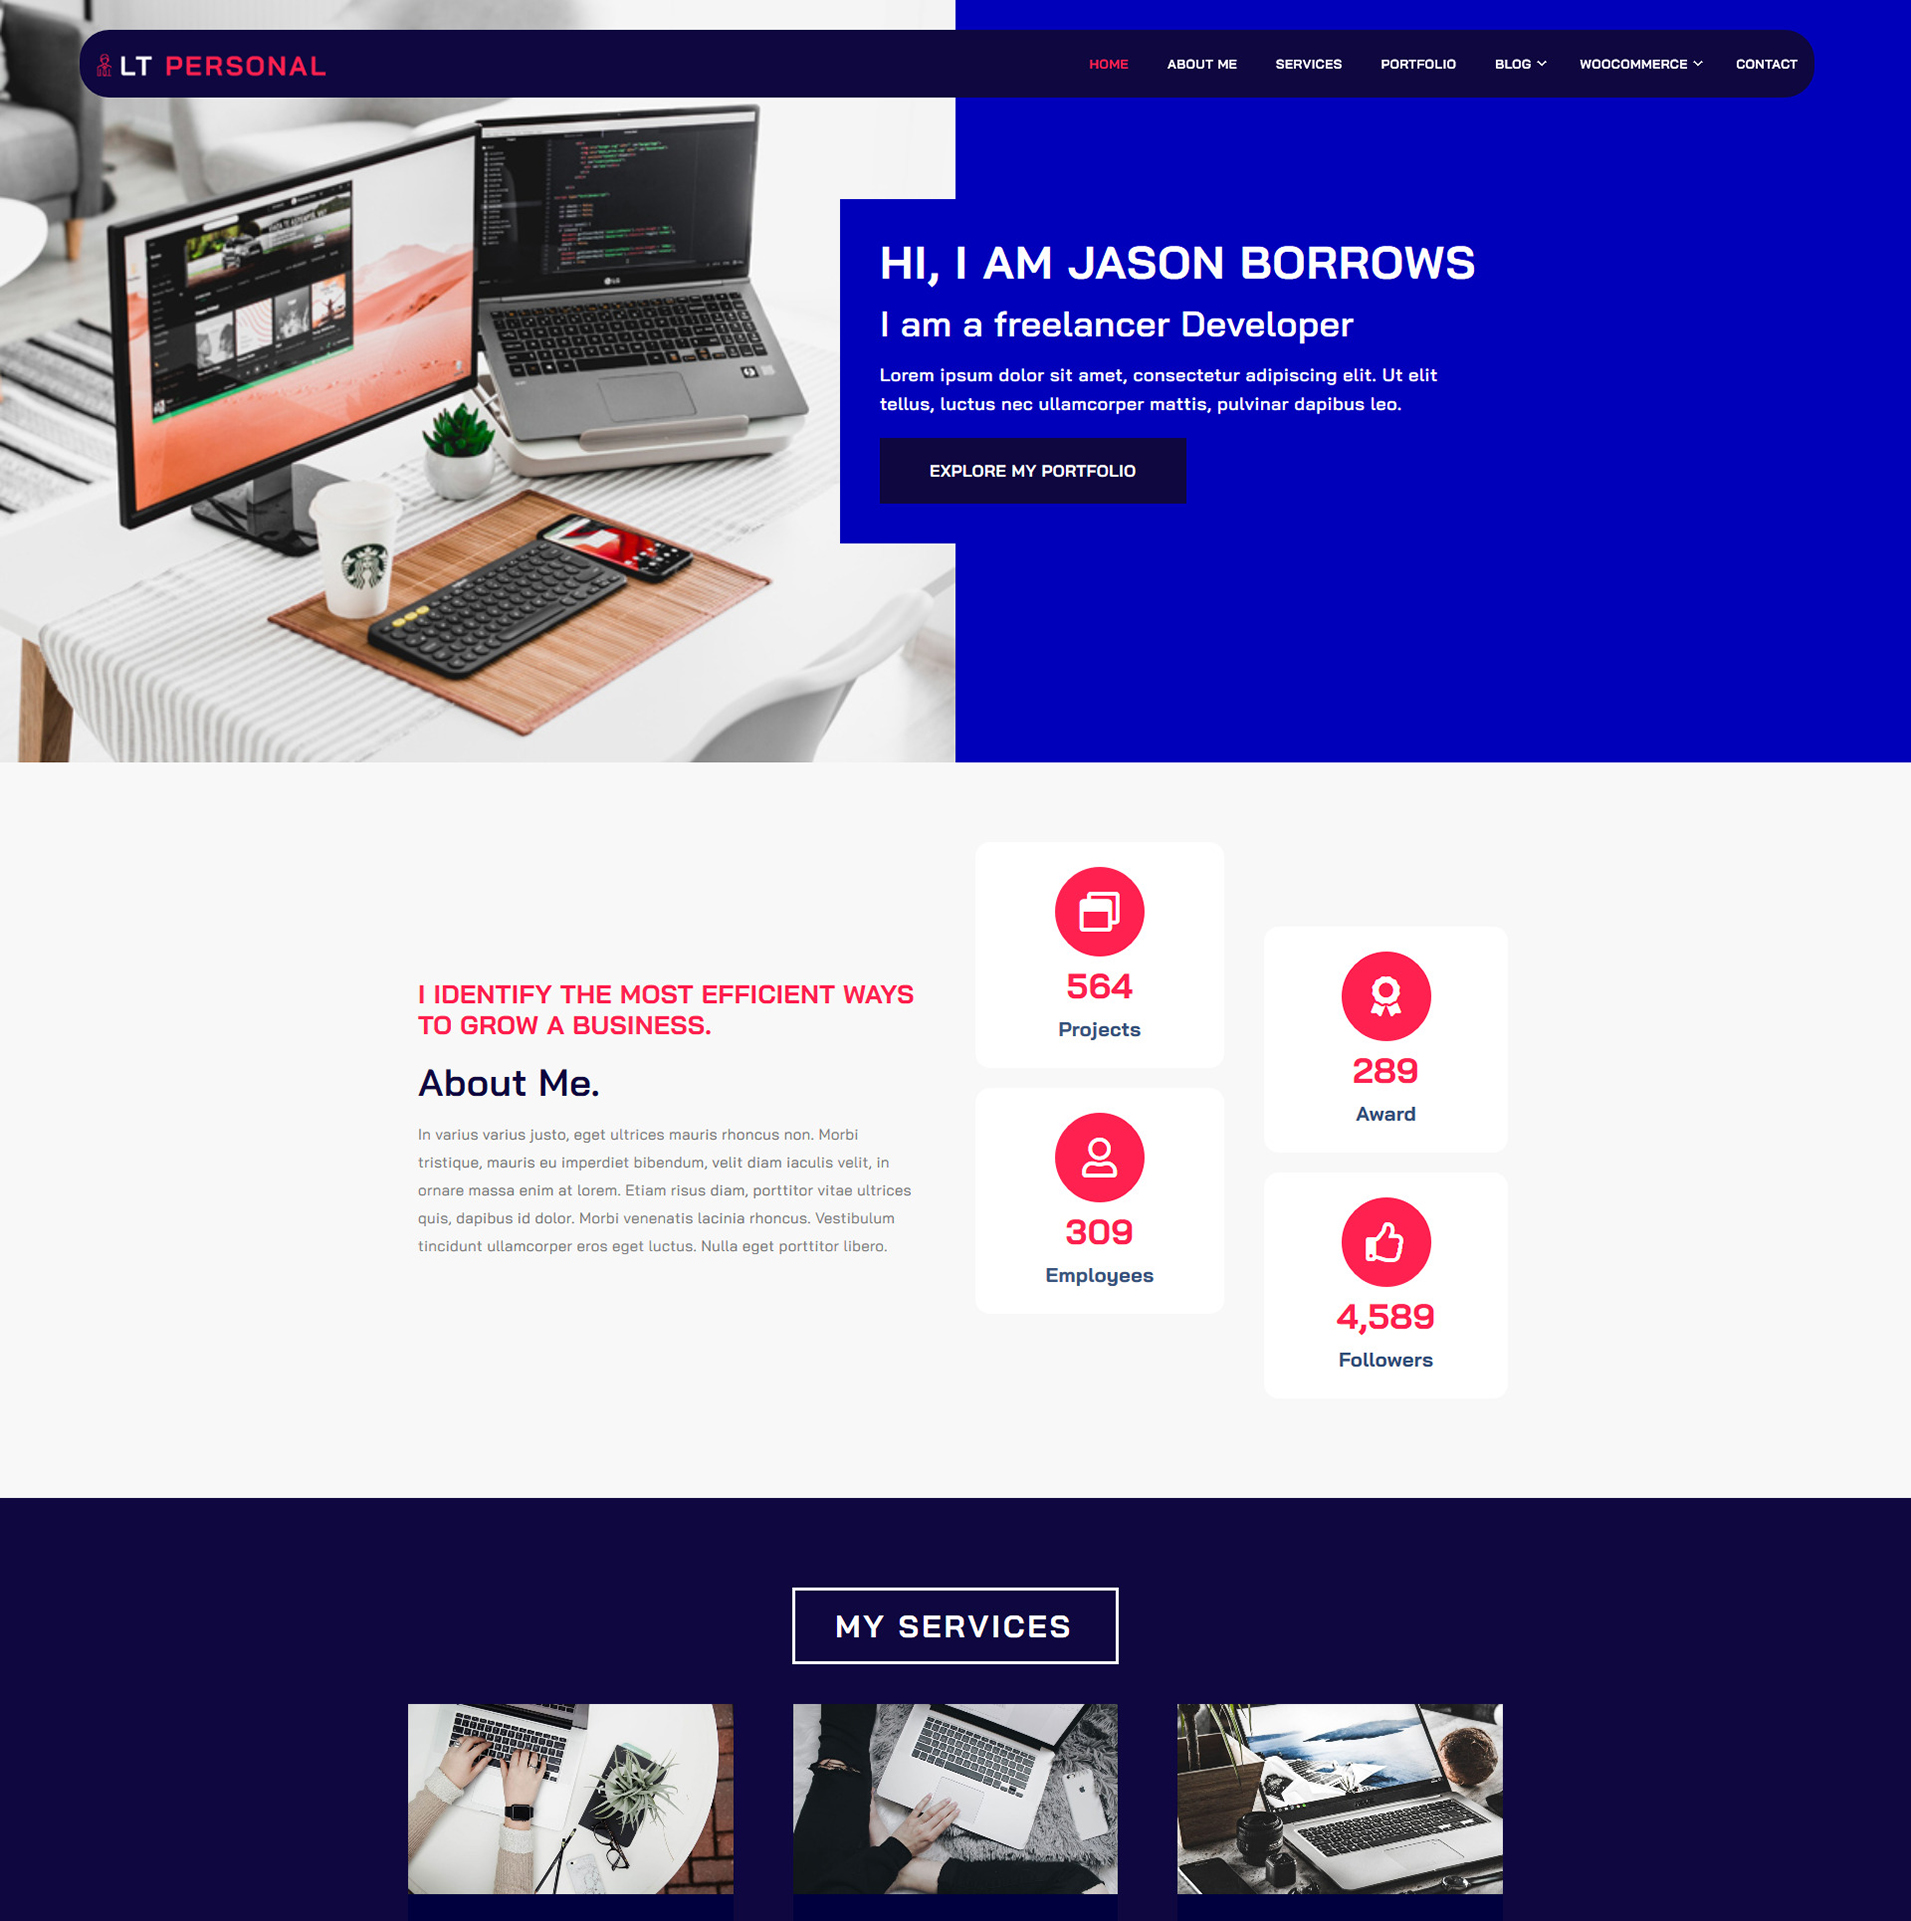 lt-personal-wordpress-theme-full